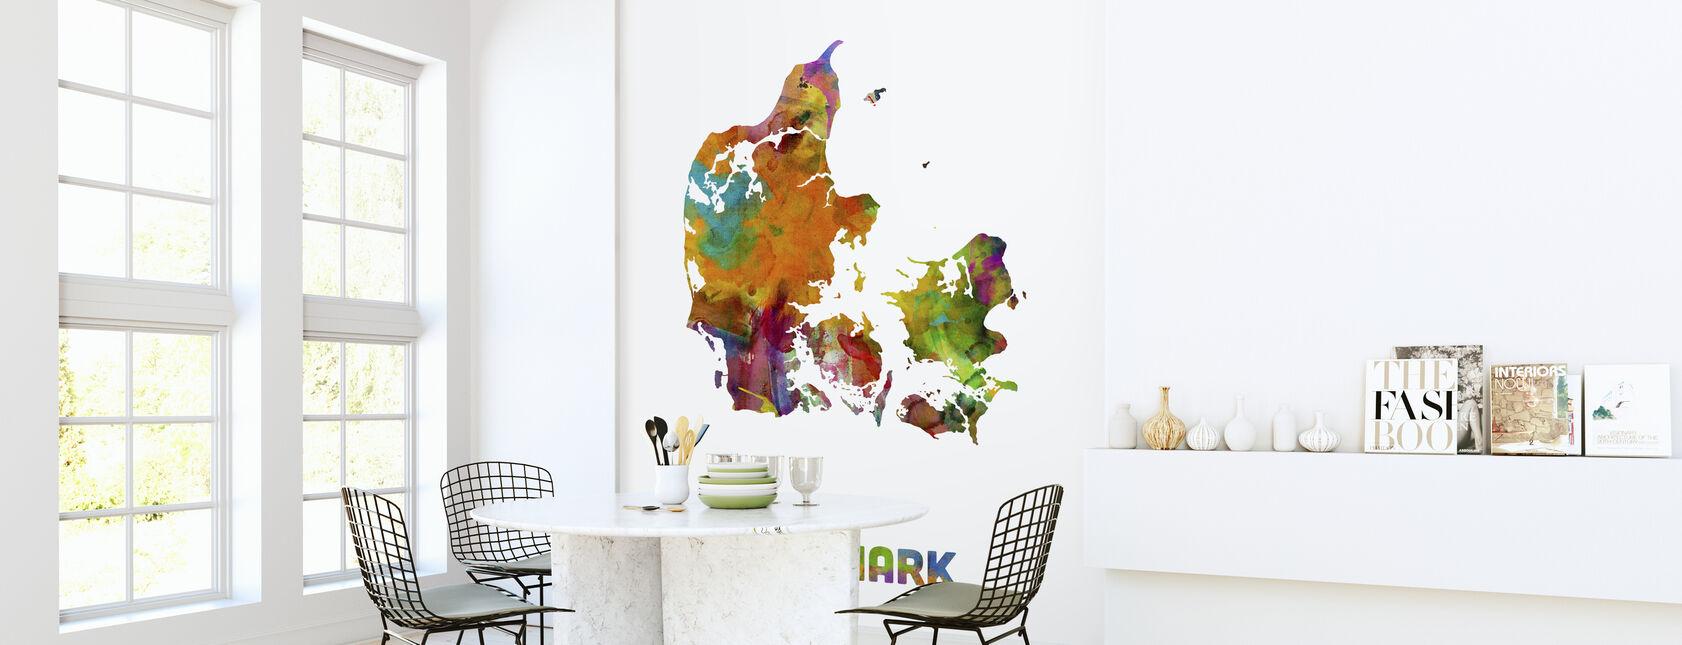 Denmark Watercolor Map - Wallpaper - Kitchen